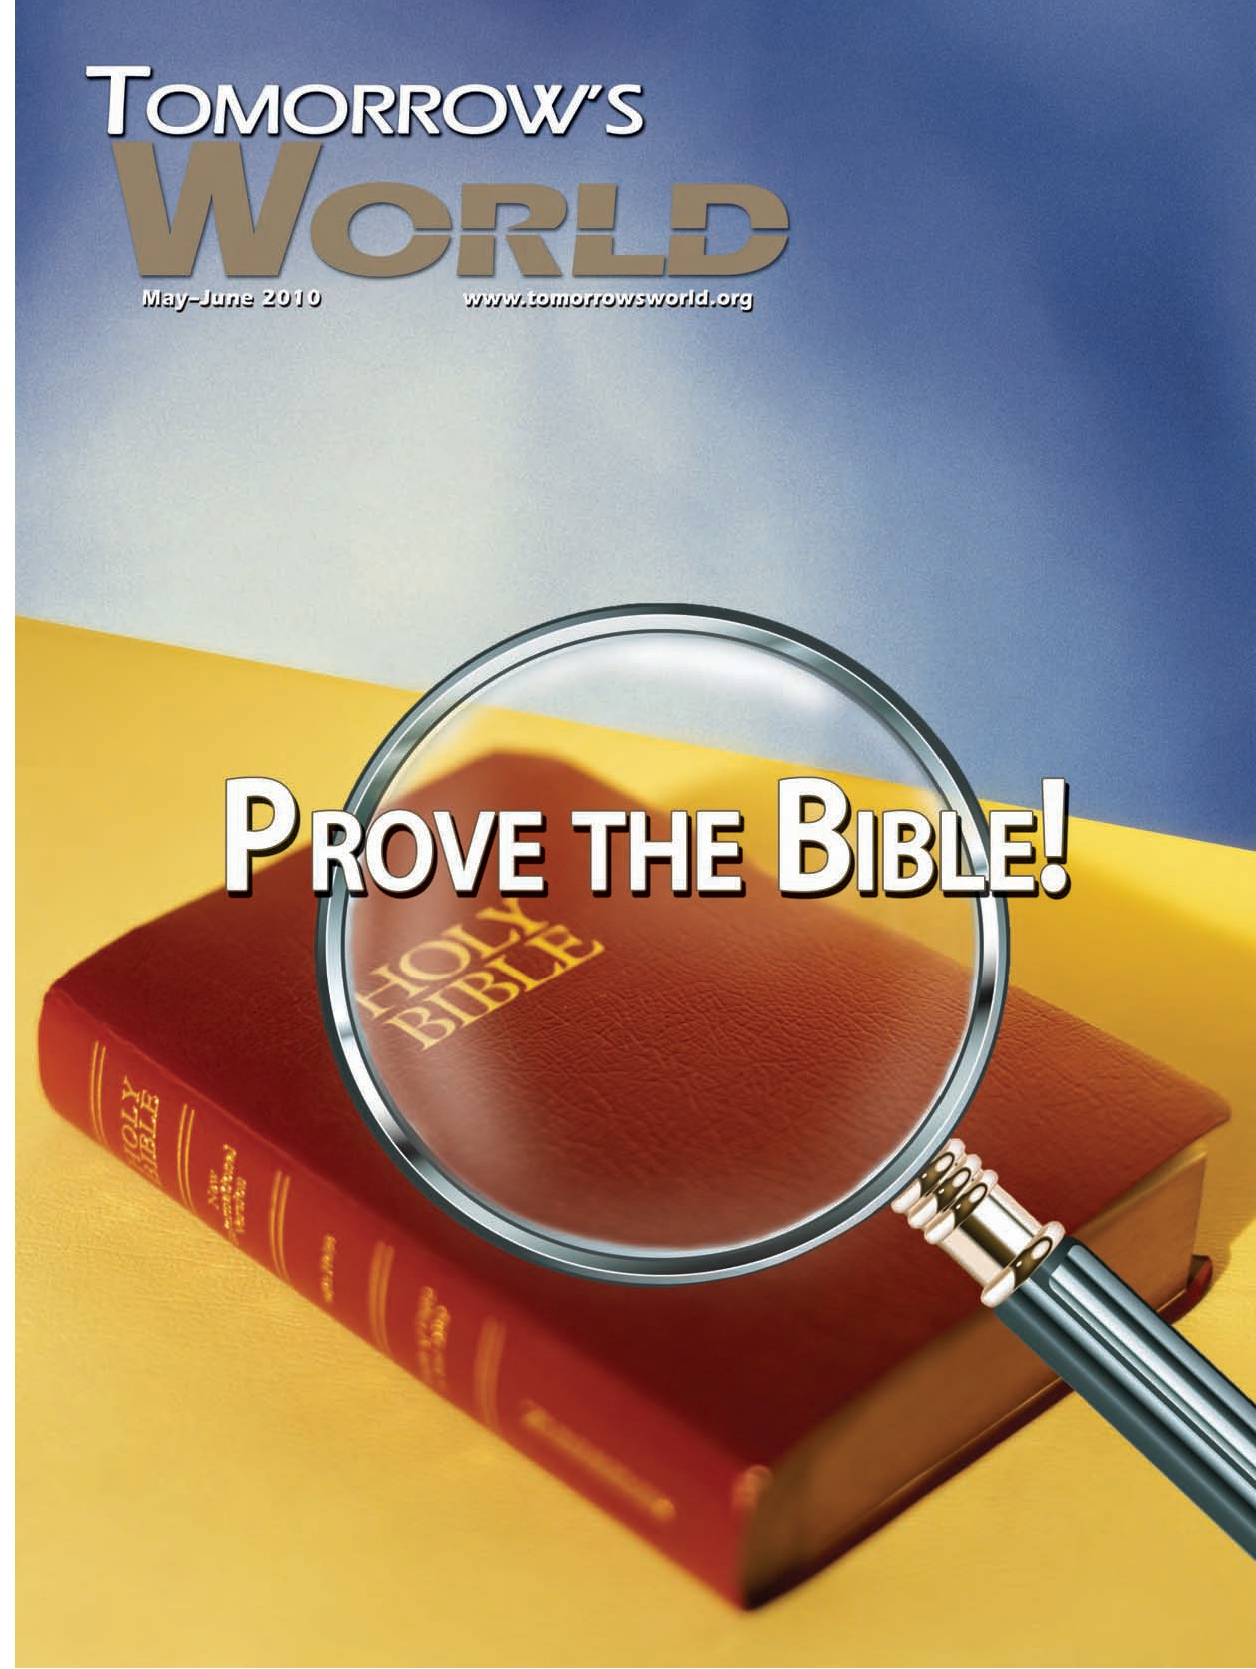 Prove the Bible! | Tomorrow's World